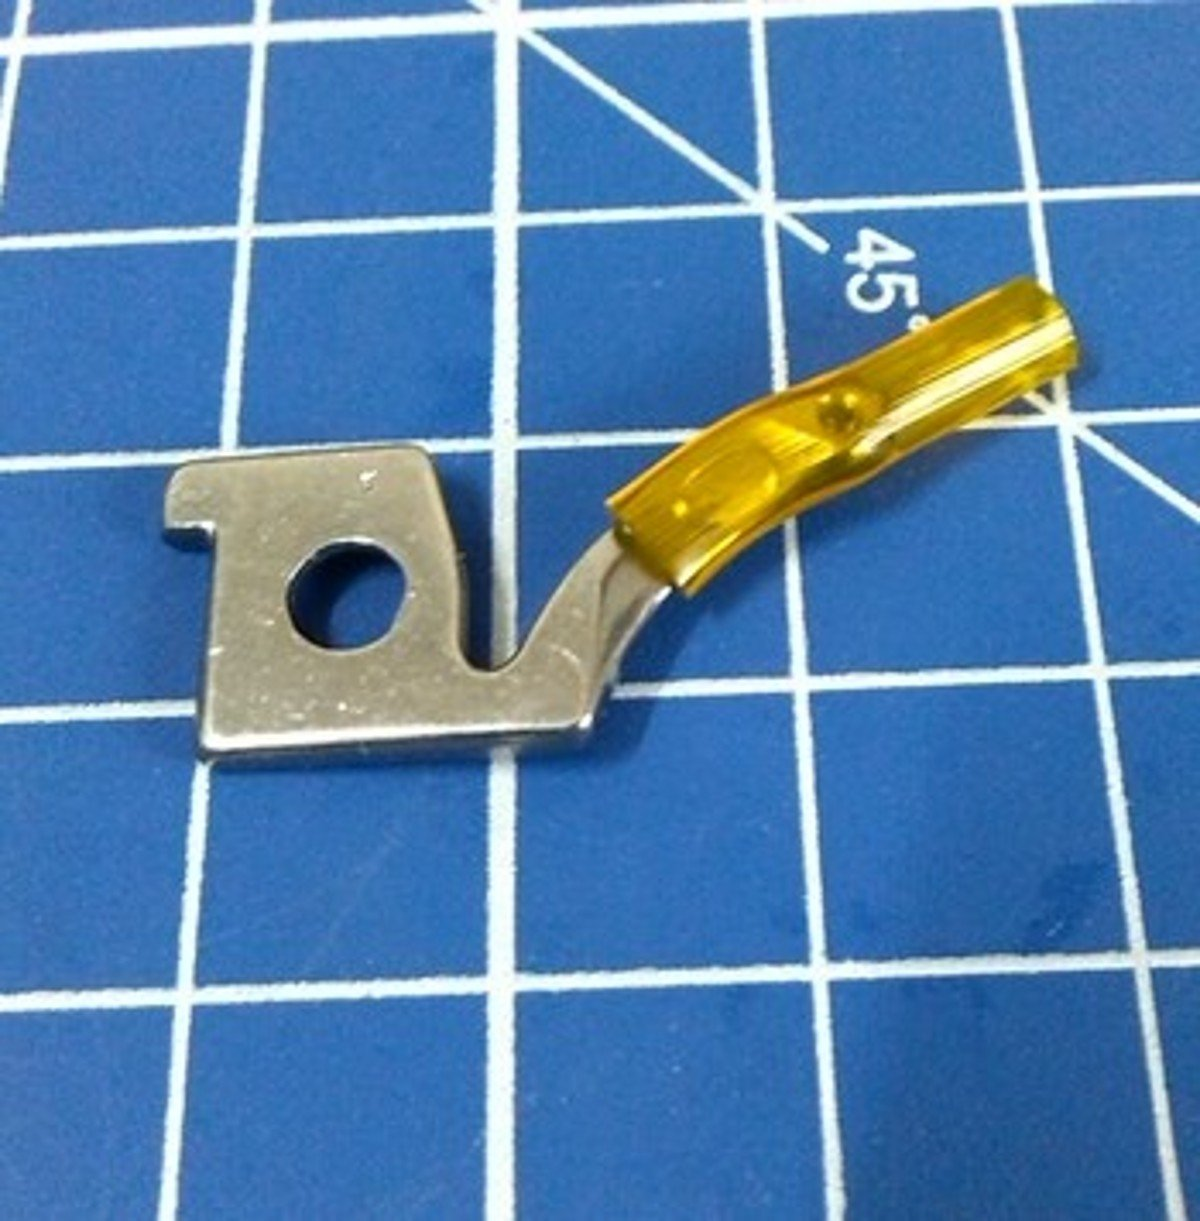 Viking 660CD /& 680CD 925D 1 Piece Upper Looper BROTHER Serger Sewing machine 1034D,3034D,5234PRW 1034 3034D 929D 3PL1500 /& PL2000 X77781-001 935D